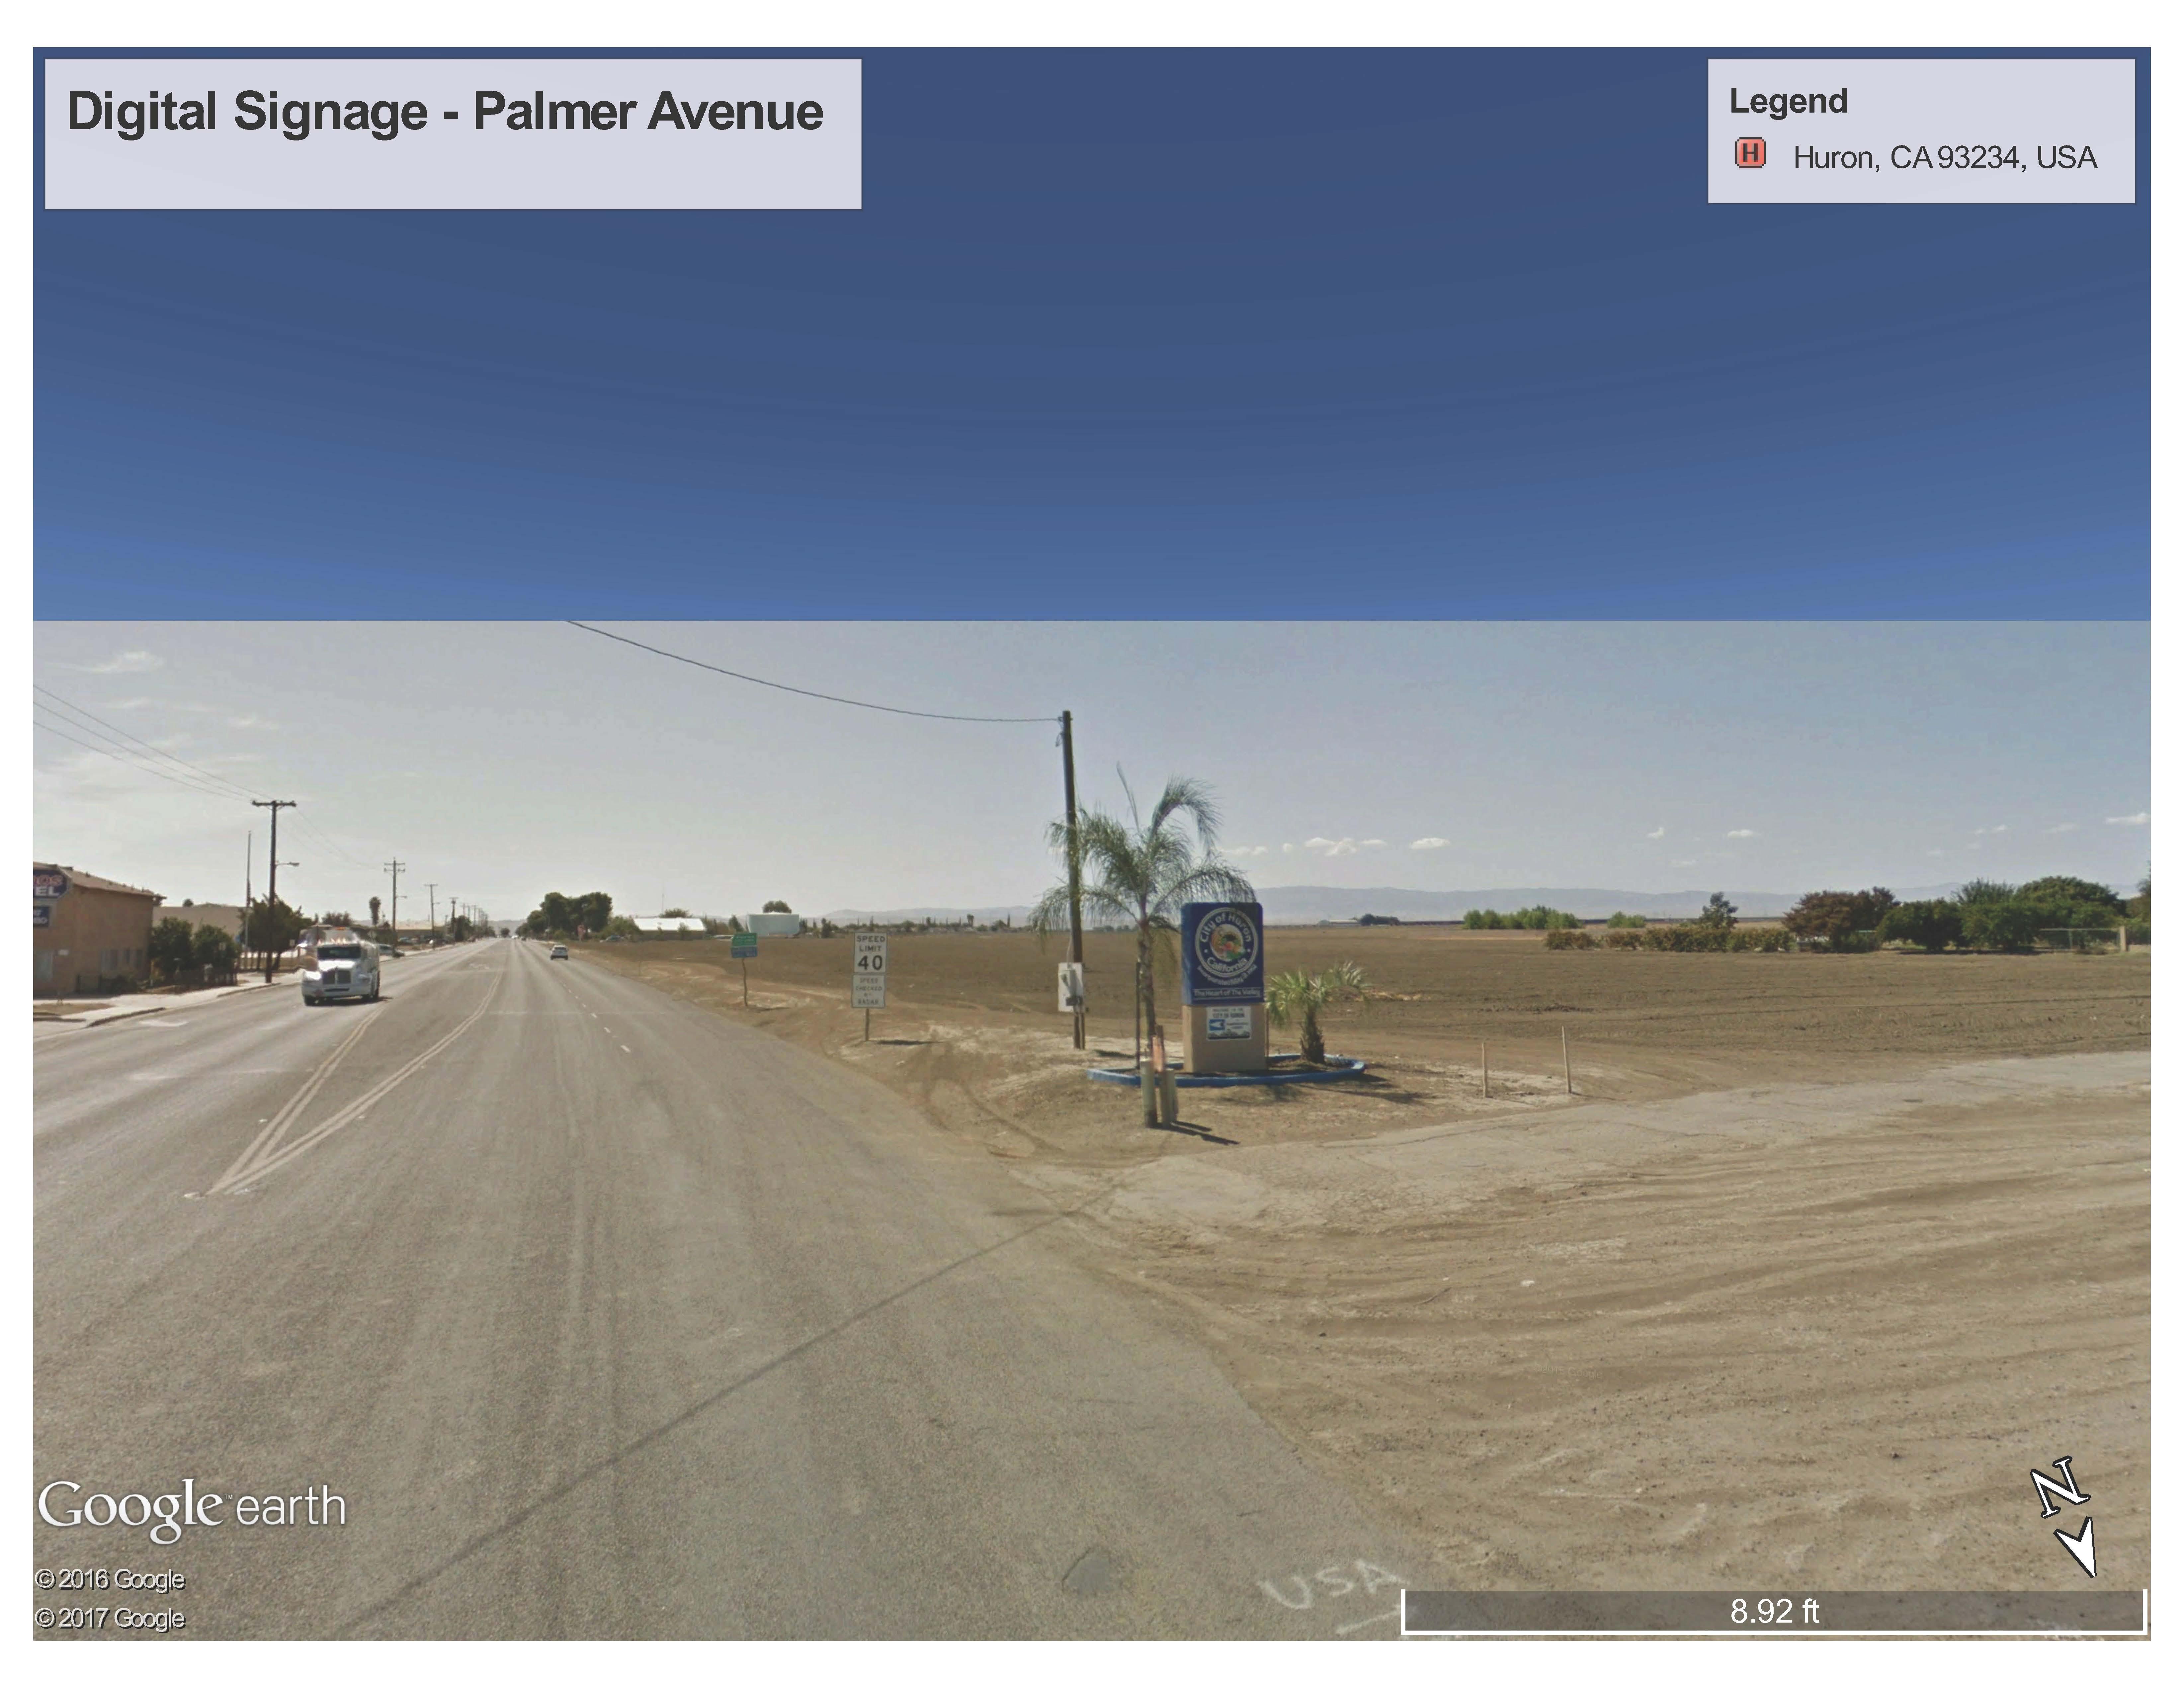 Digital Signage Palmer